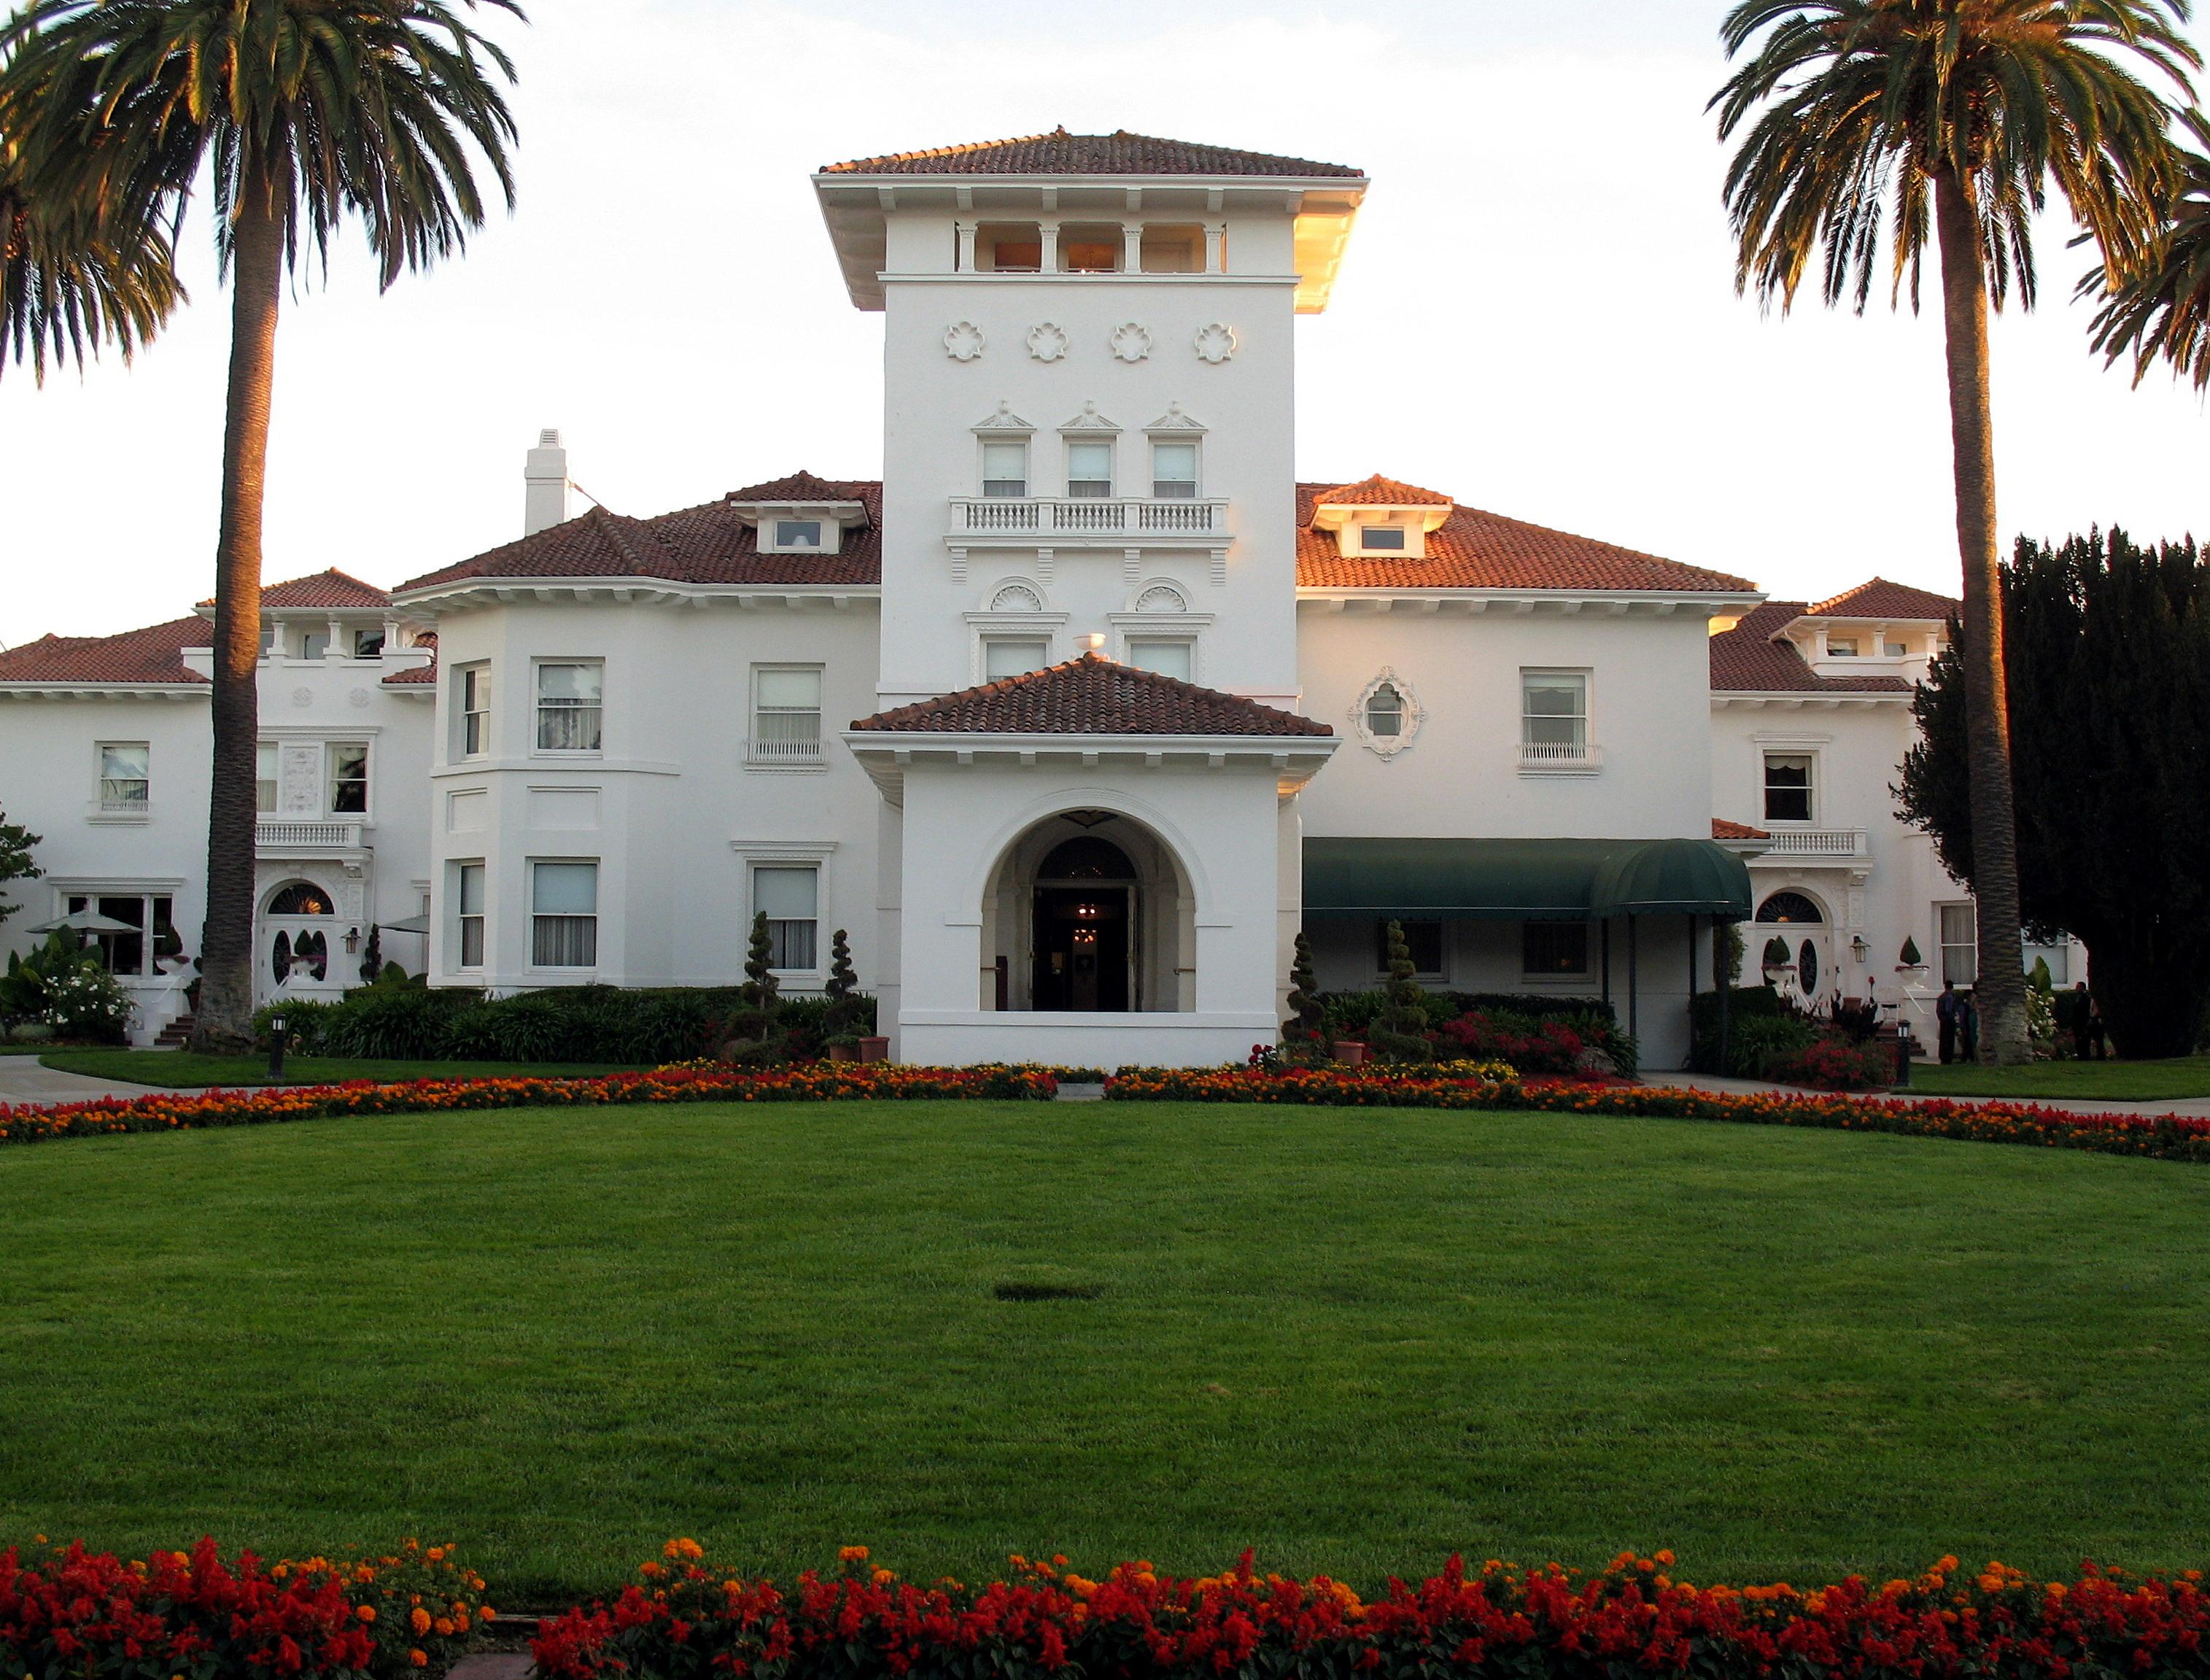 Hayes Mansion, 200 Edenvale Ave., San Jose, CA 9-23-2012 6-49-36 PM.JPG